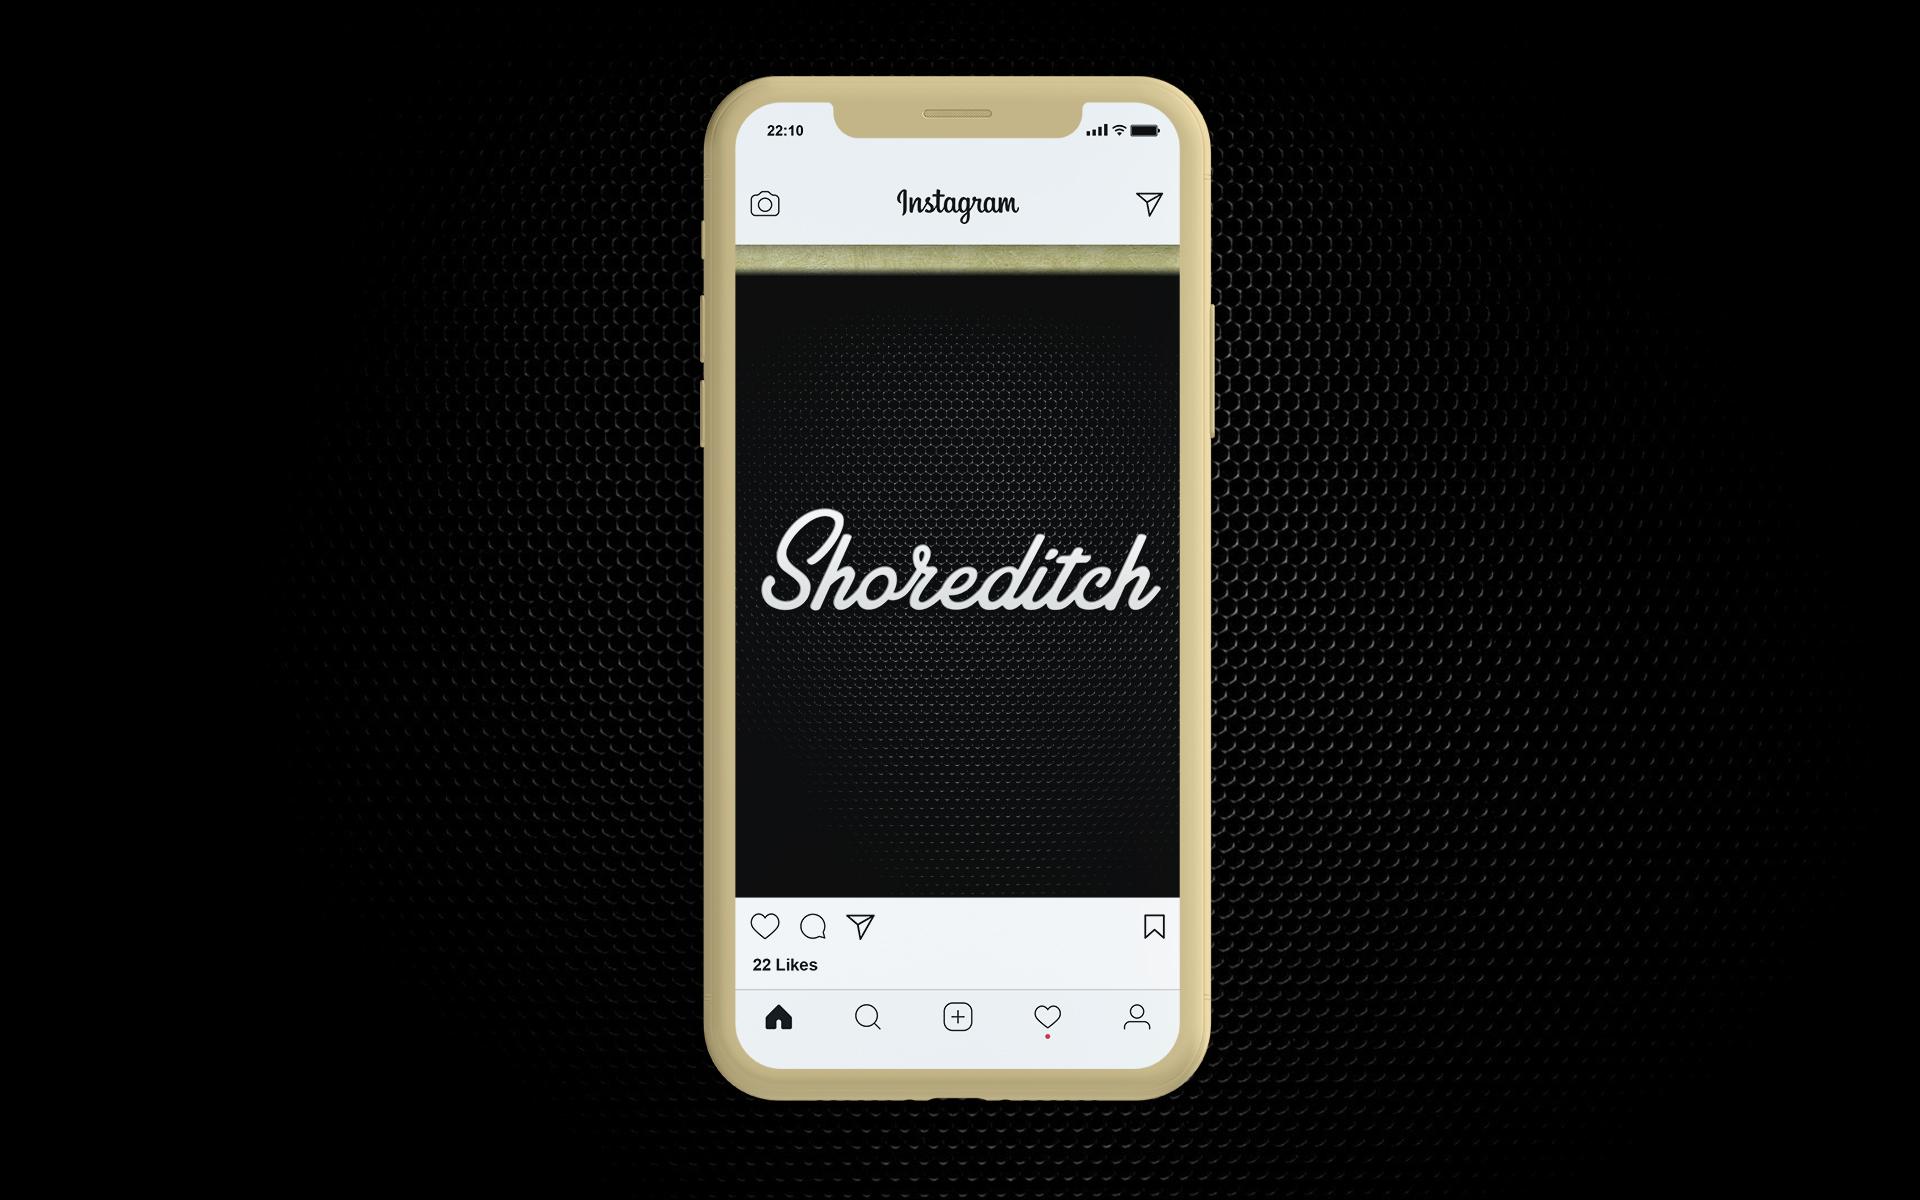 tube_brands__0001_Shoreditch